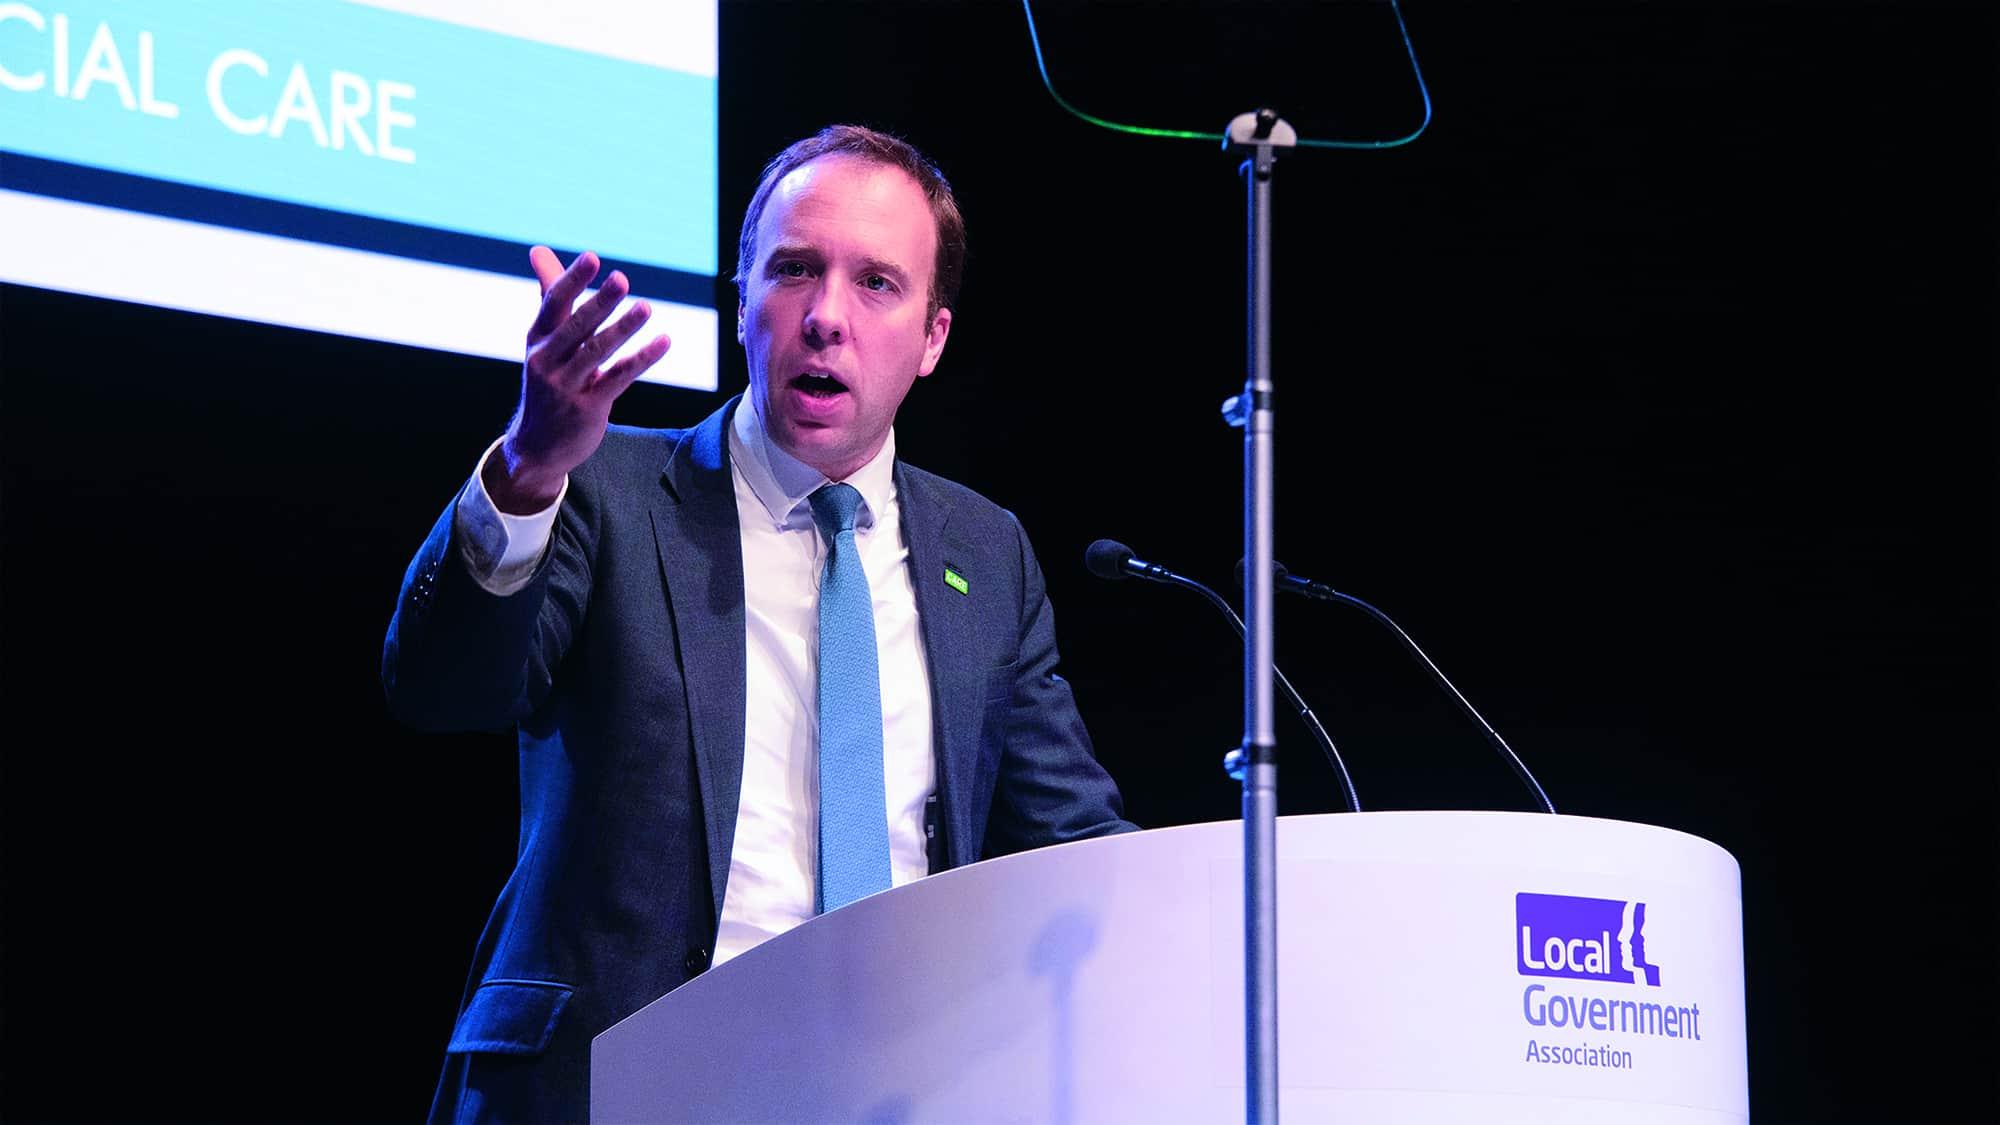 Matt Hancock MP on stage